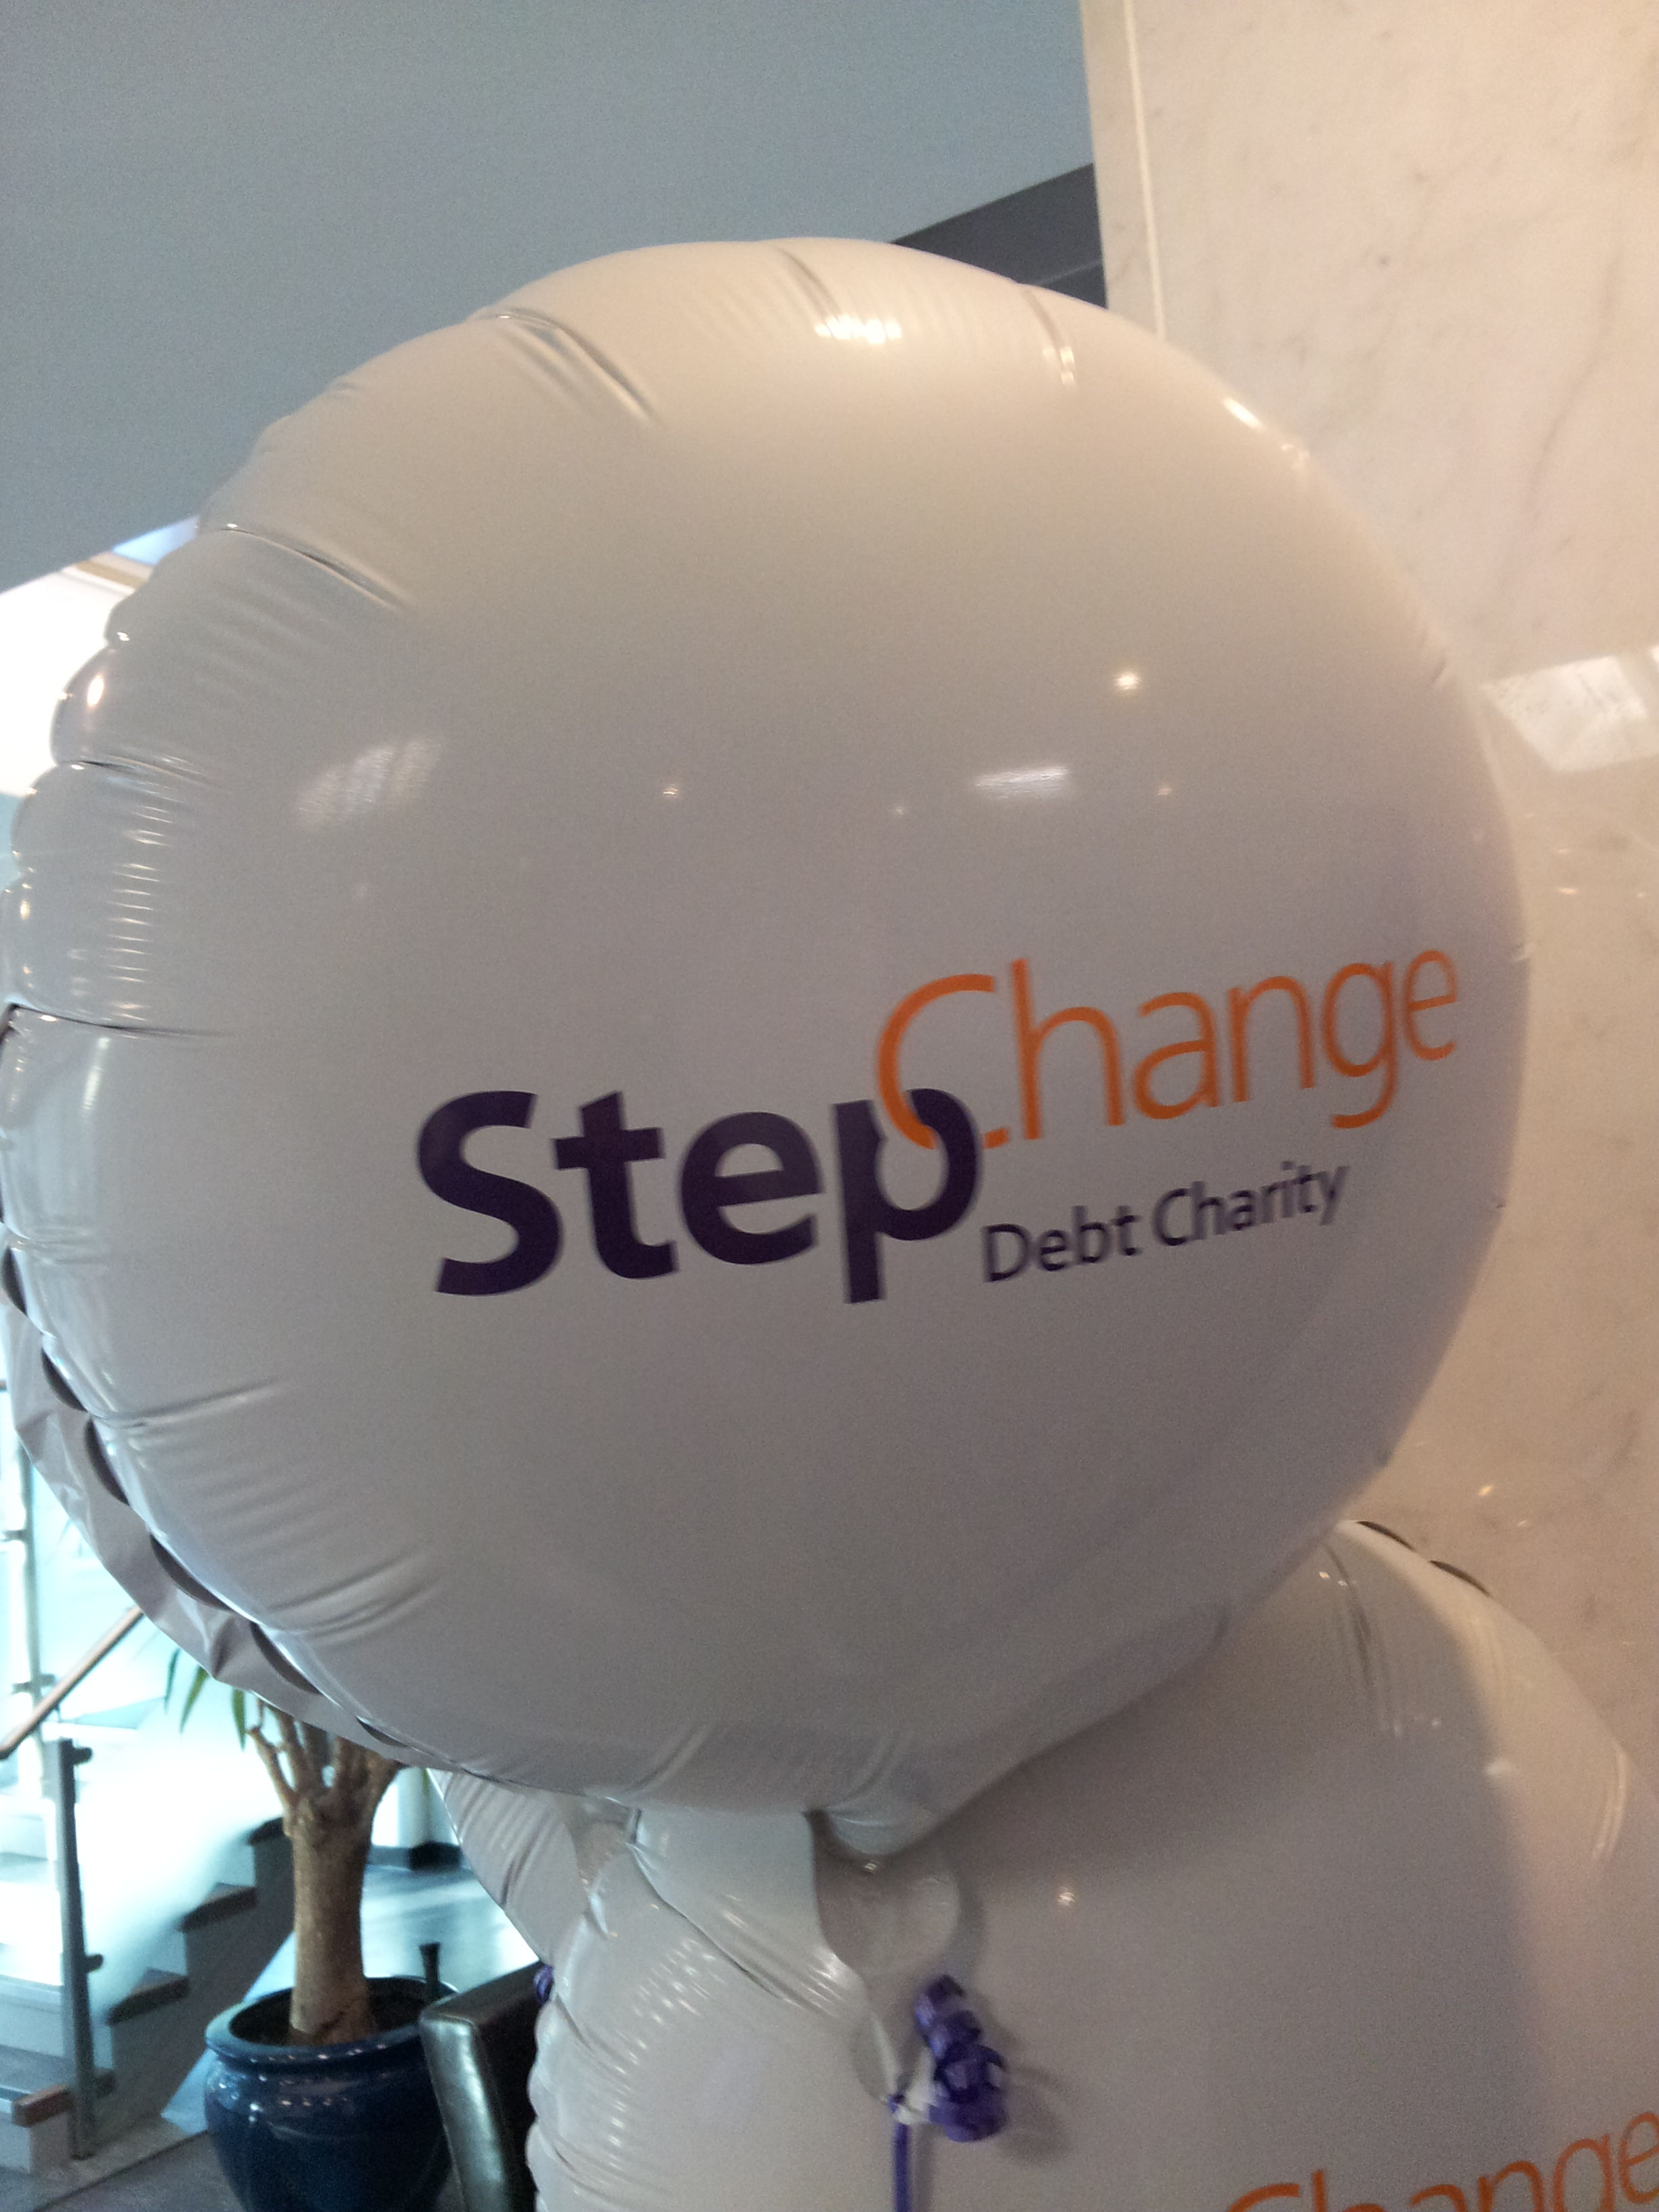 StepChange balloon